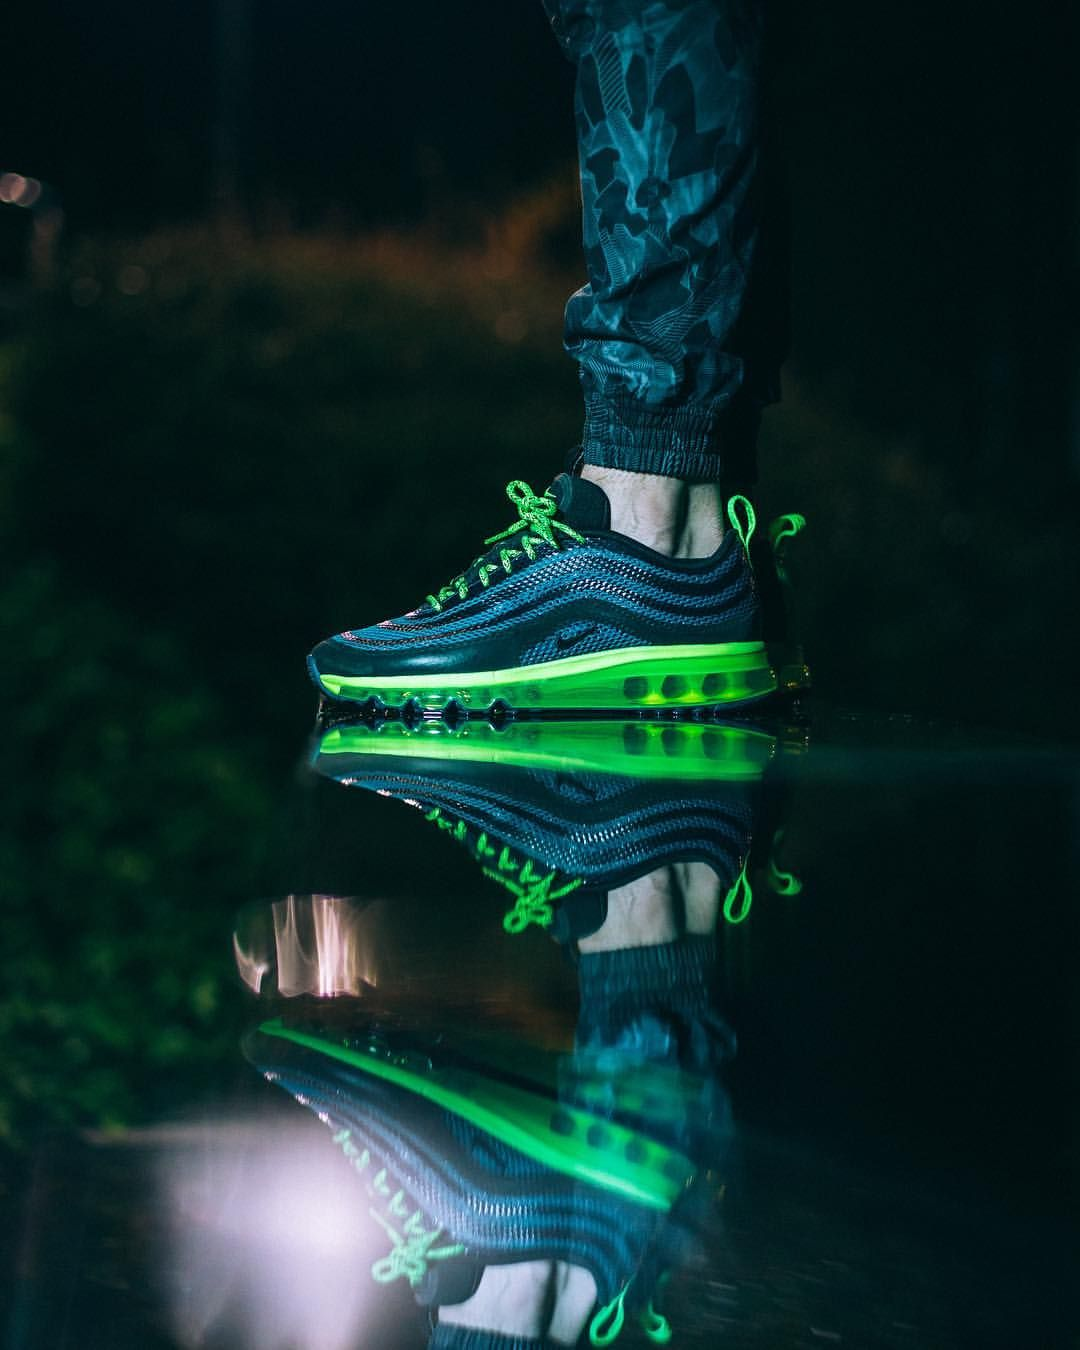 Nike Air Max 97 Hyperfuse